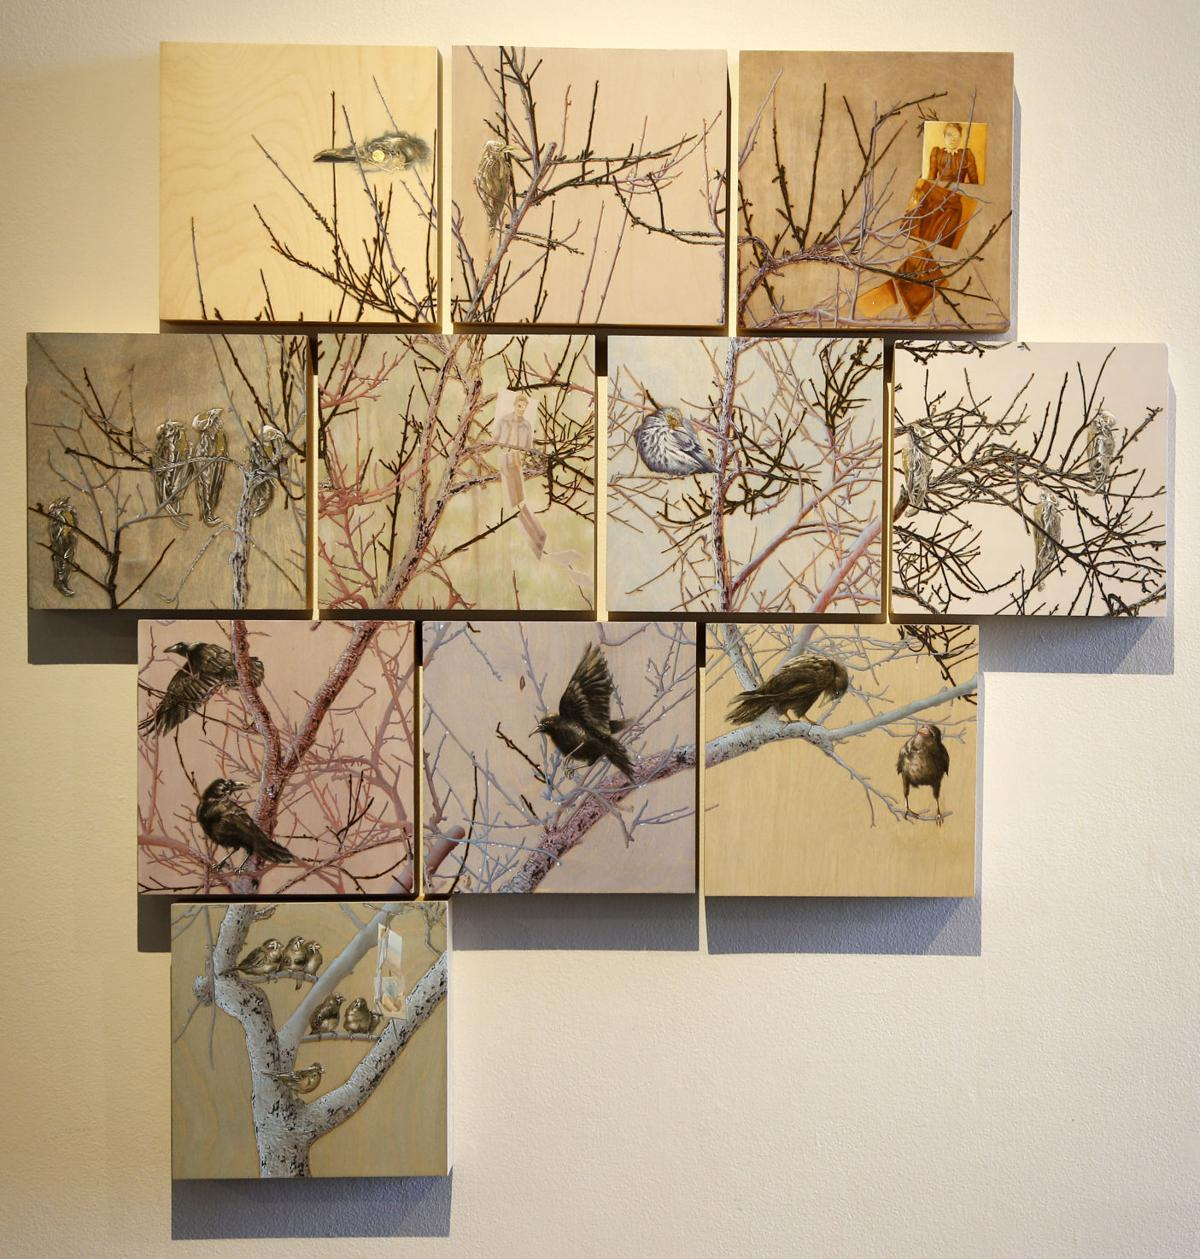 022818bp-moline-kramer-exhibit-02